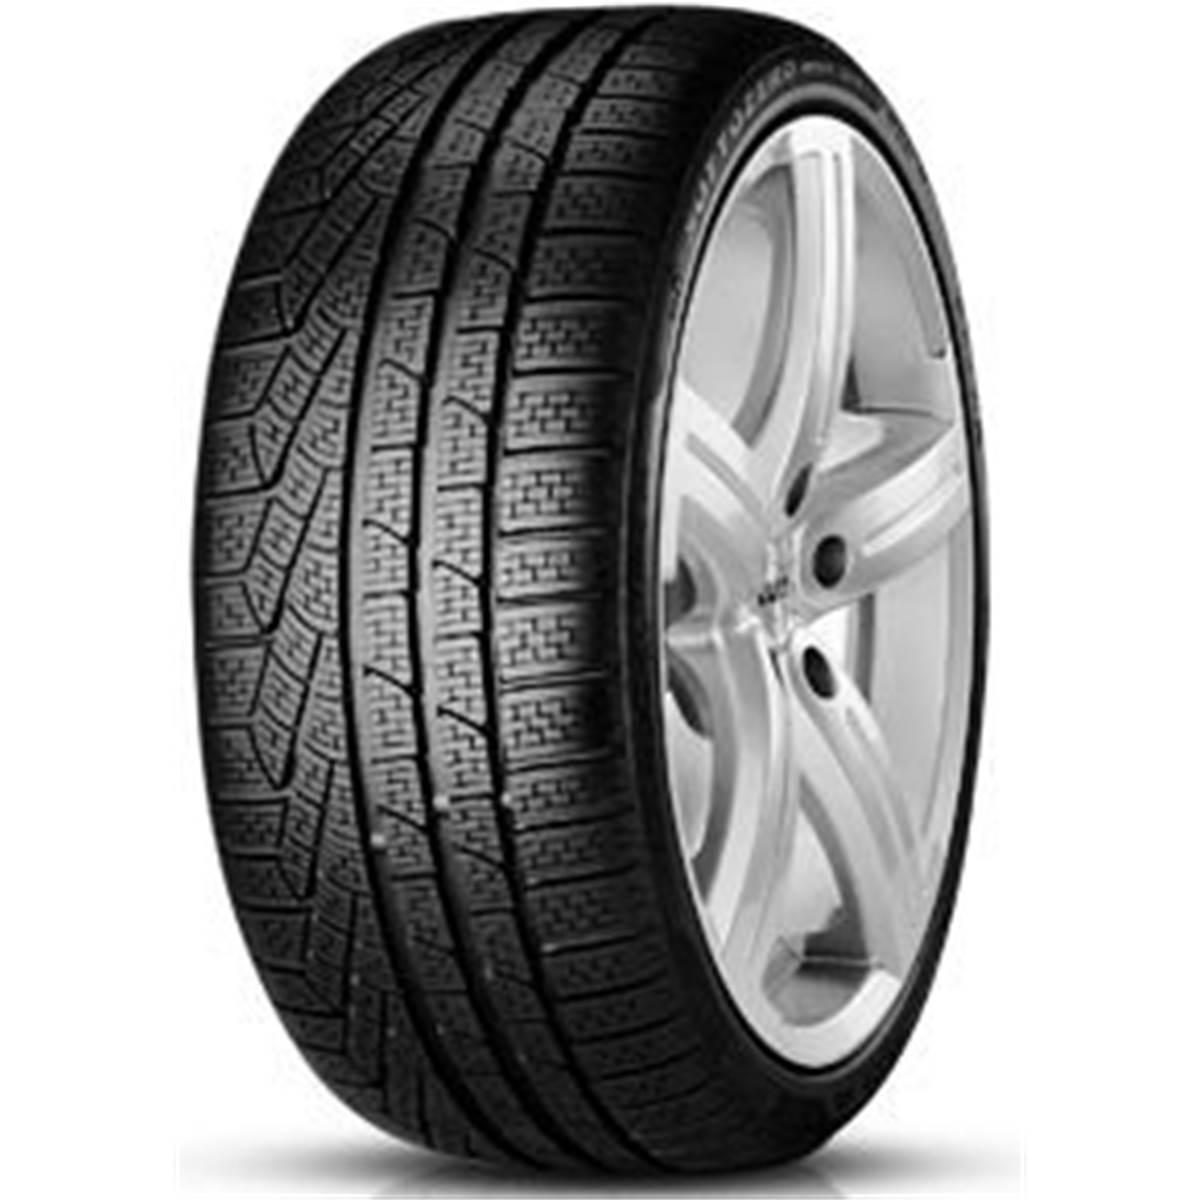 Pirelli Winter 240 Sottozero Ii Xl